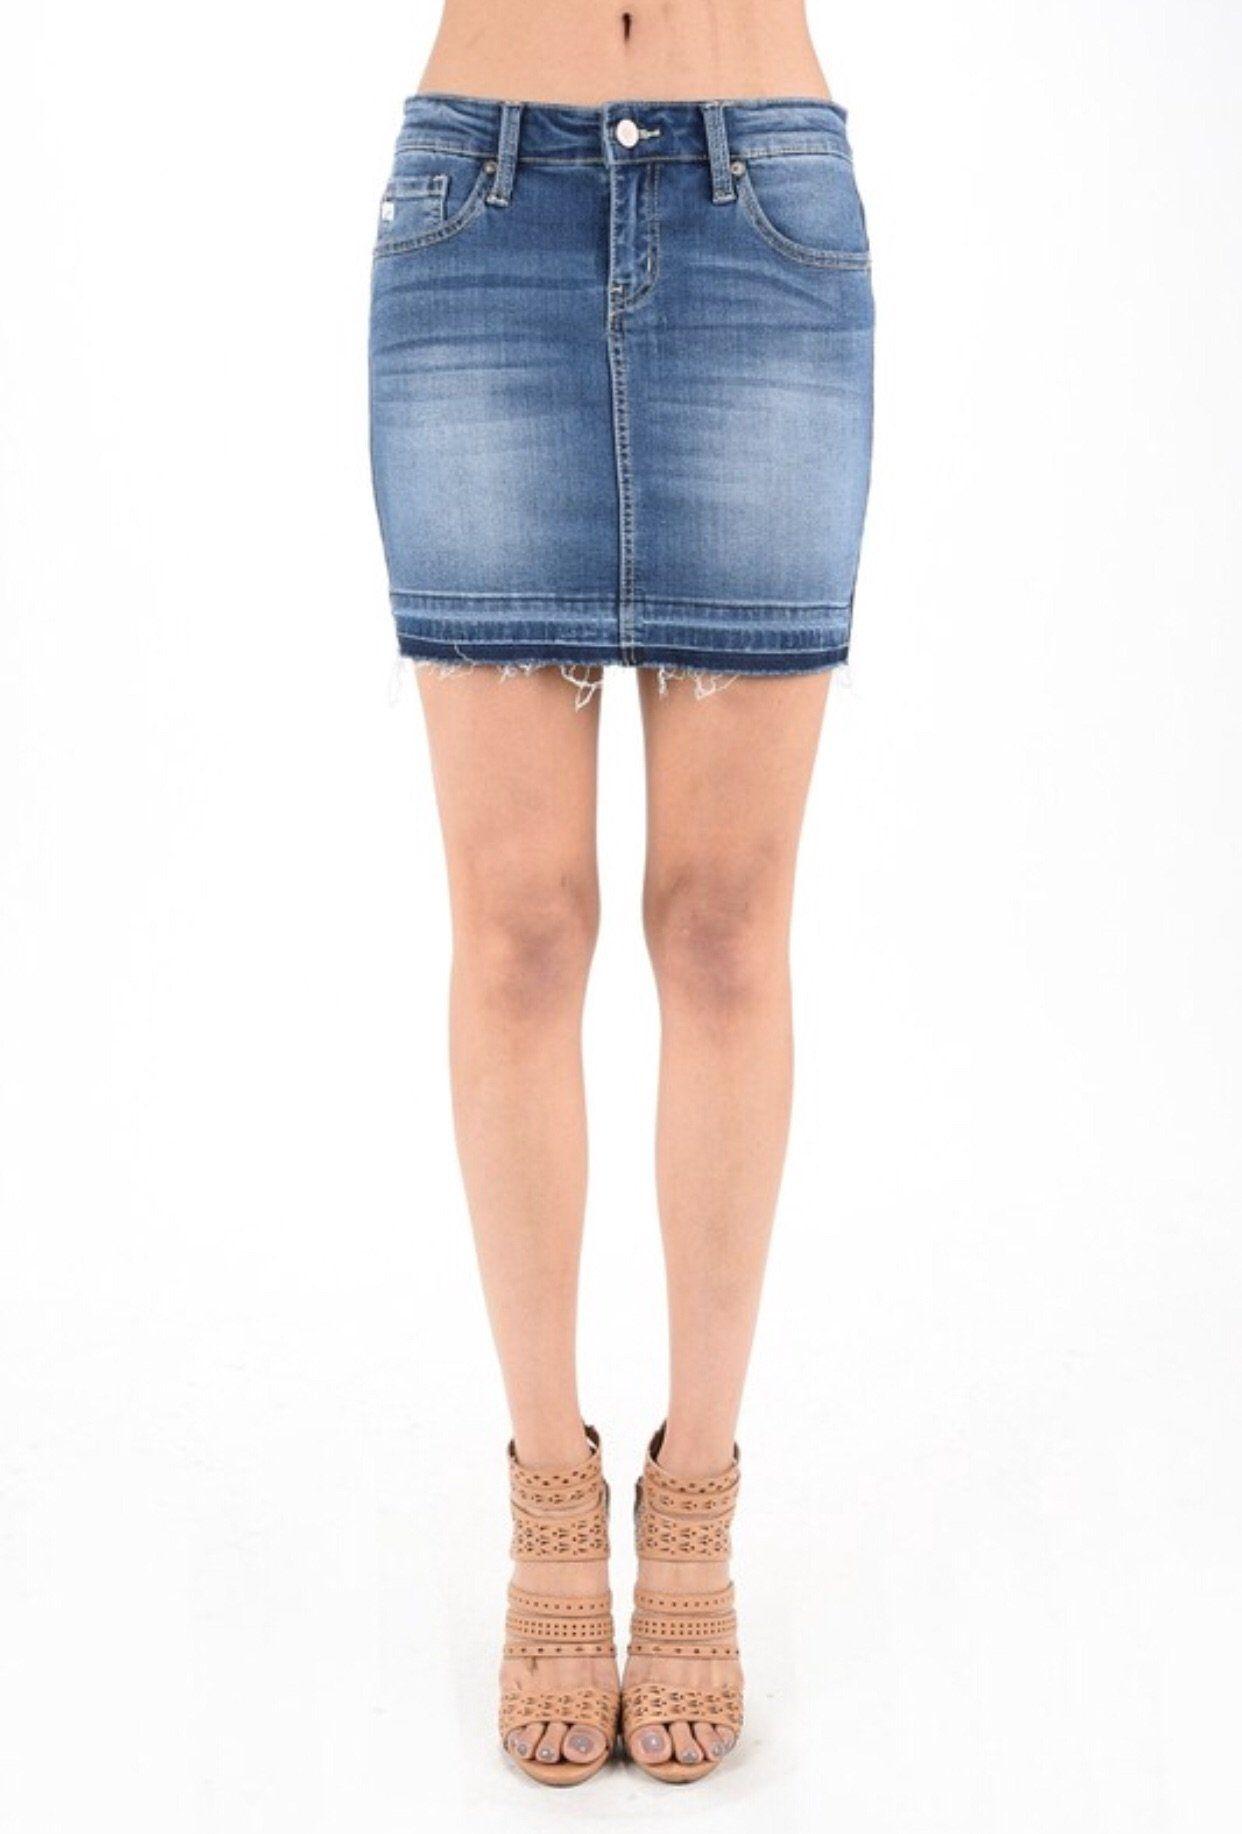 7483db56f633 Best denim skirt - kancan